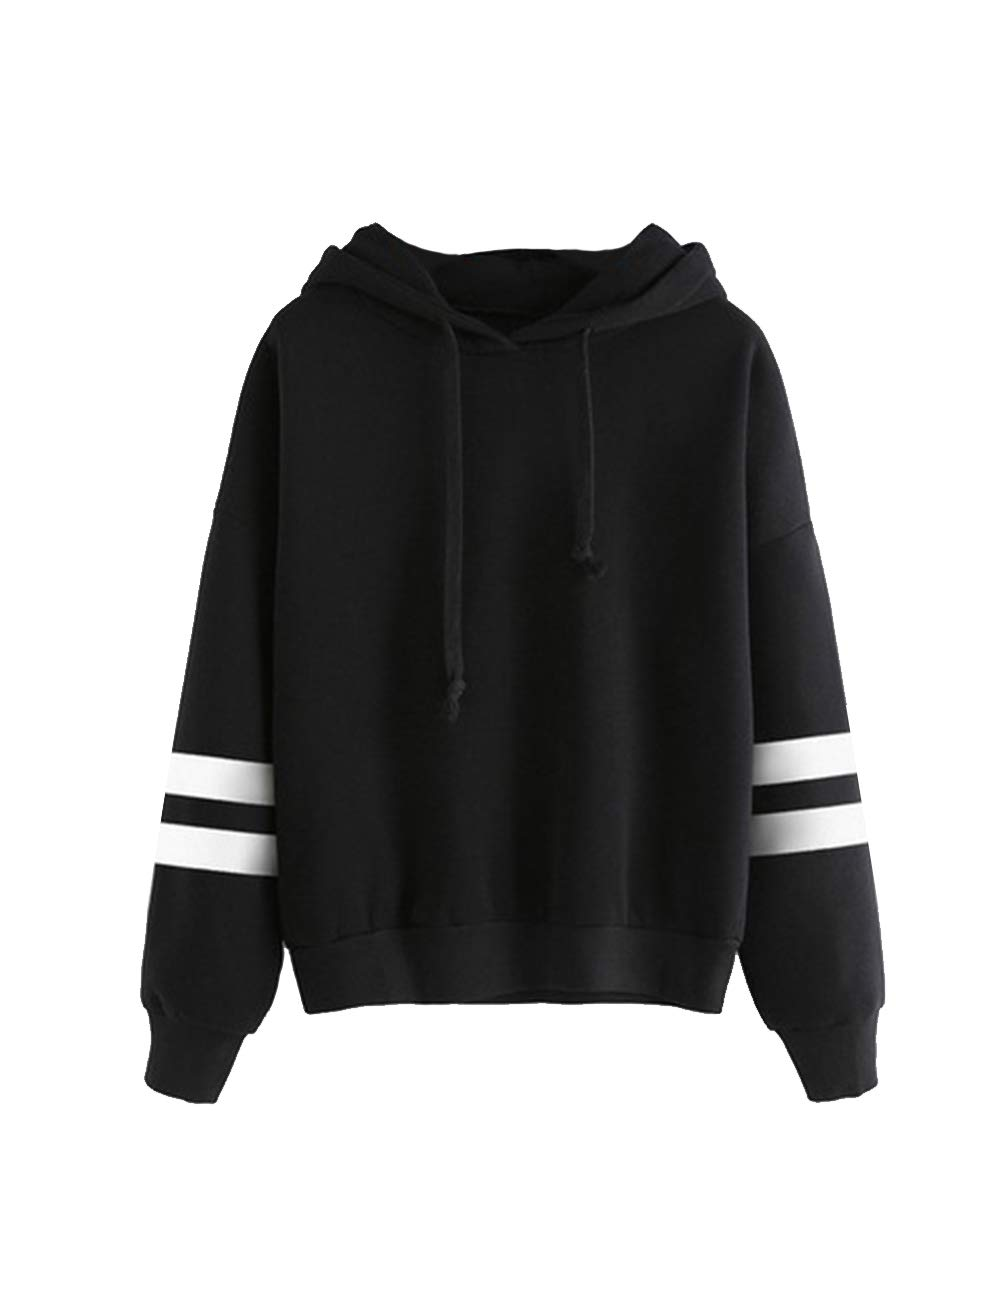 Women Hoodie Sweatshirt Clearance Teen Girls Stripe Long Sleeve Loose Pullover Jumper Sweater Jacket Shirts Tops (Black, S)